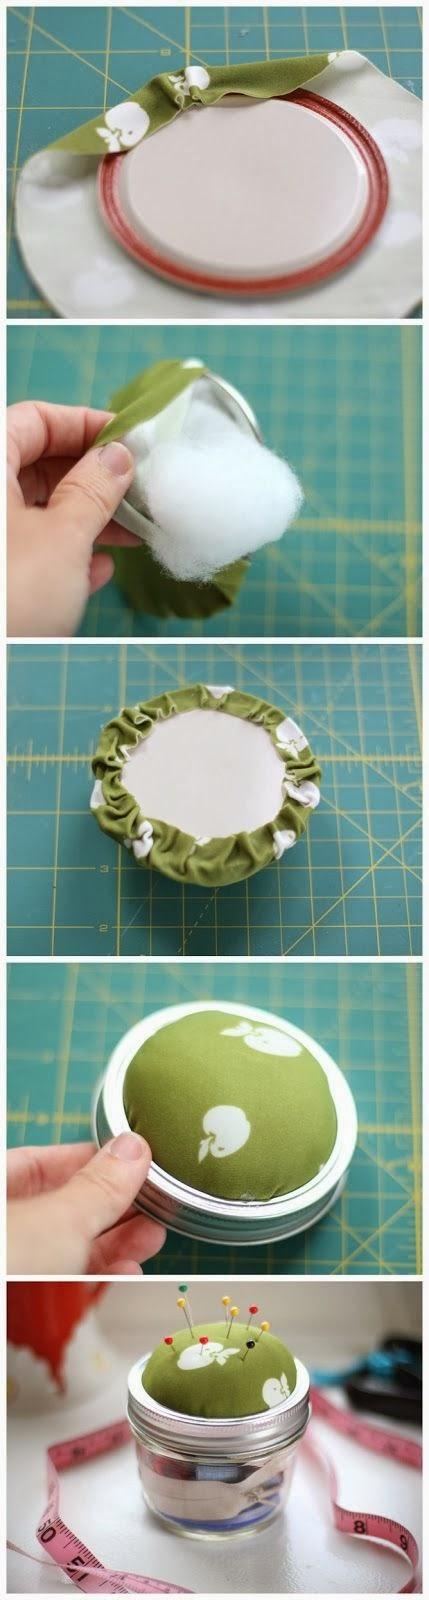 ♥ Mason Jar Sewing Kit